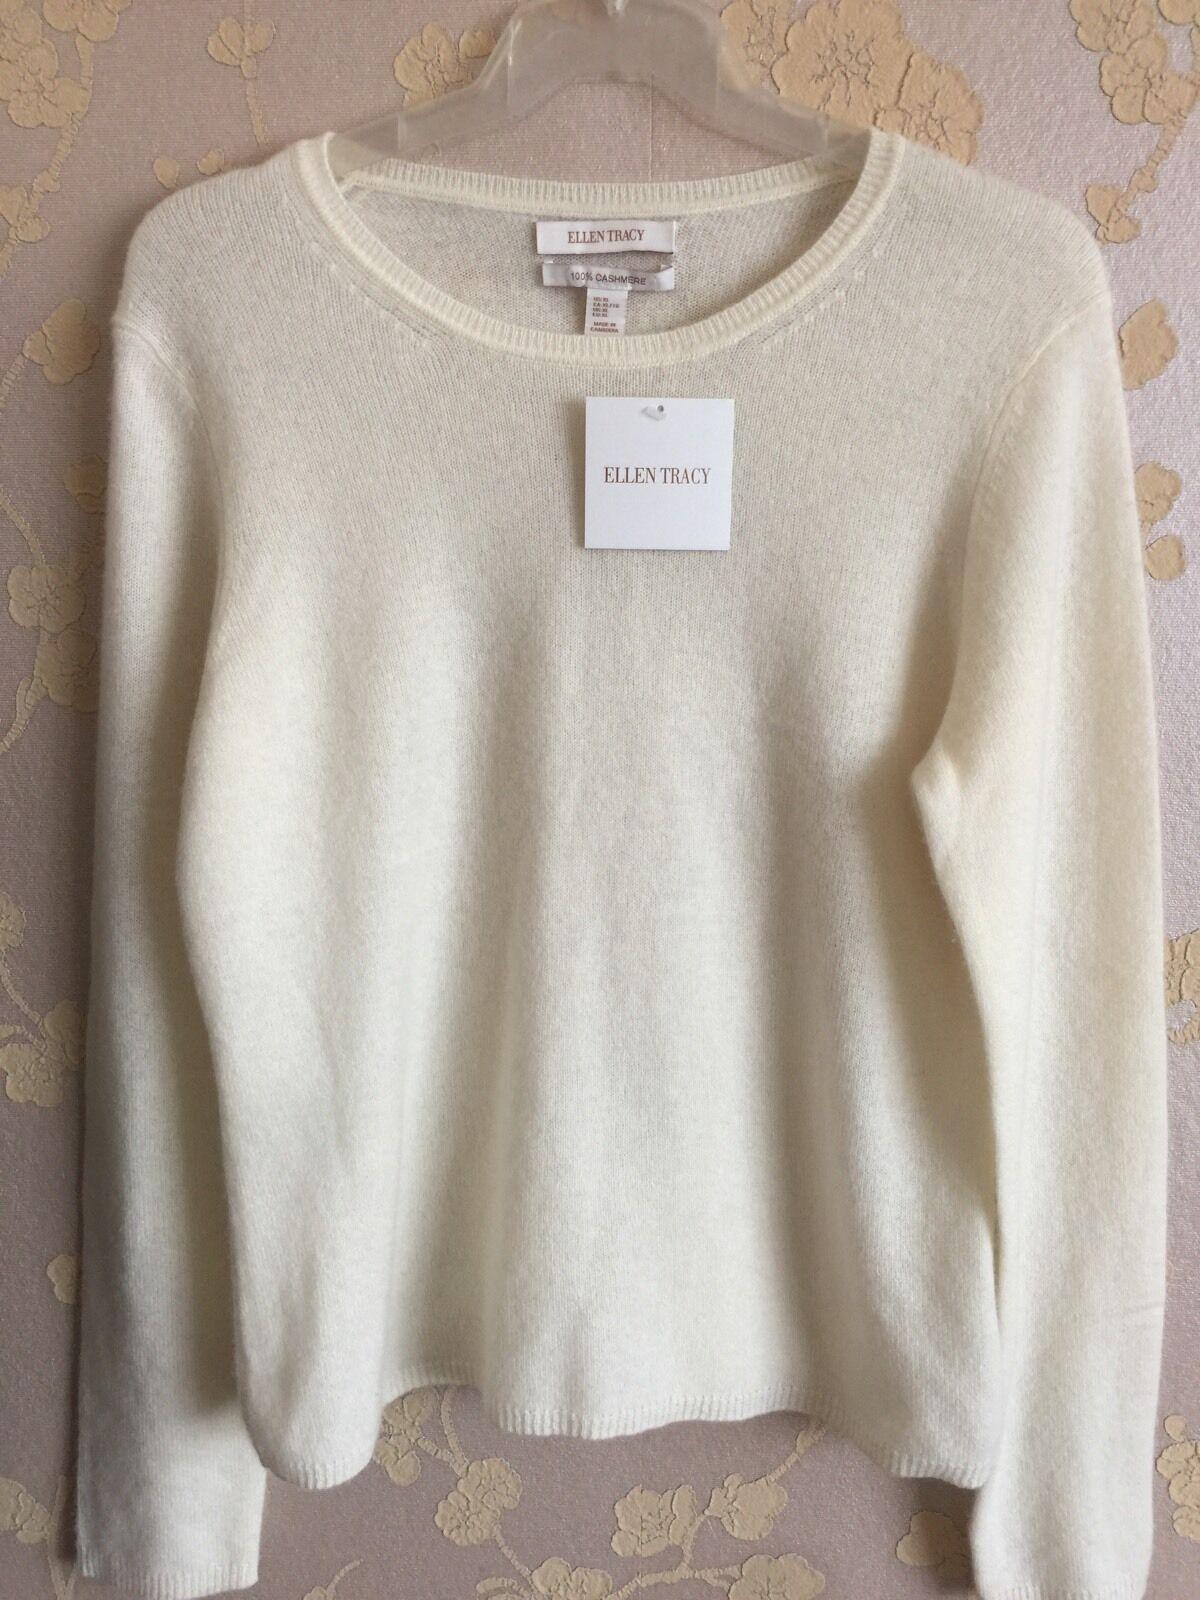 New ELLEN TRACY 100% Cashmere Knit Sweater Size XL UK BNWT